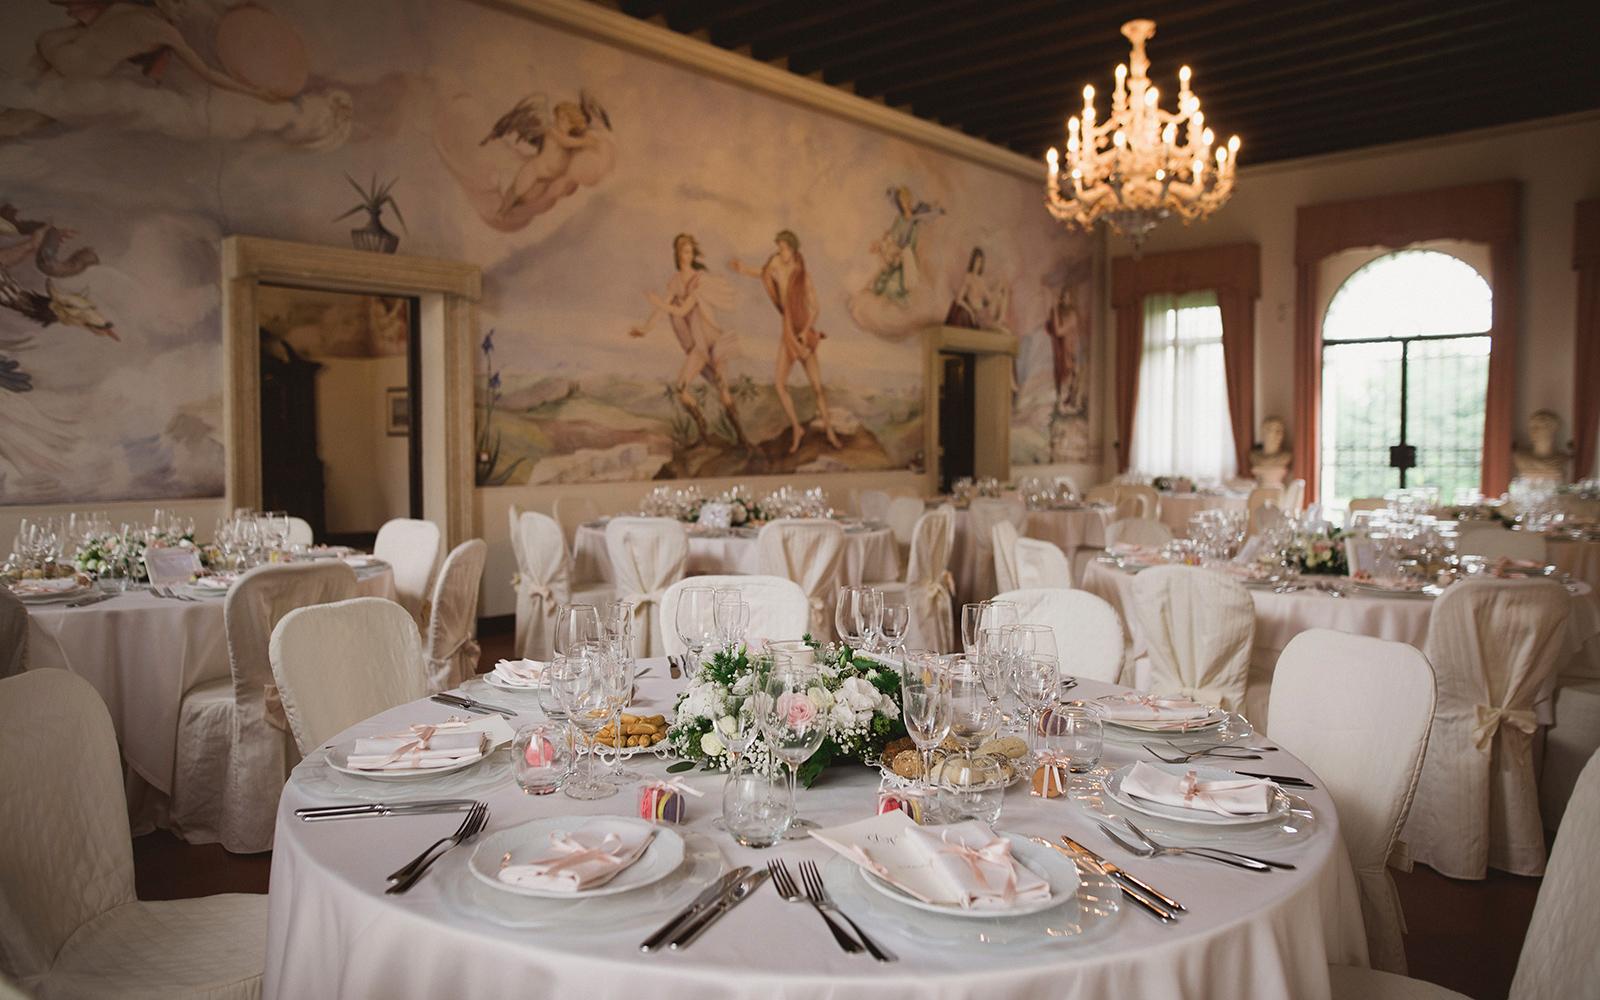 Sala ricevimento matrimonio, feste di matrimonio Vicenza, feste di matrimonio Padova, location con giardino esterno Vicenza, Vicenza ricevimento matrimonio Vicenza matrimonio ricevimento